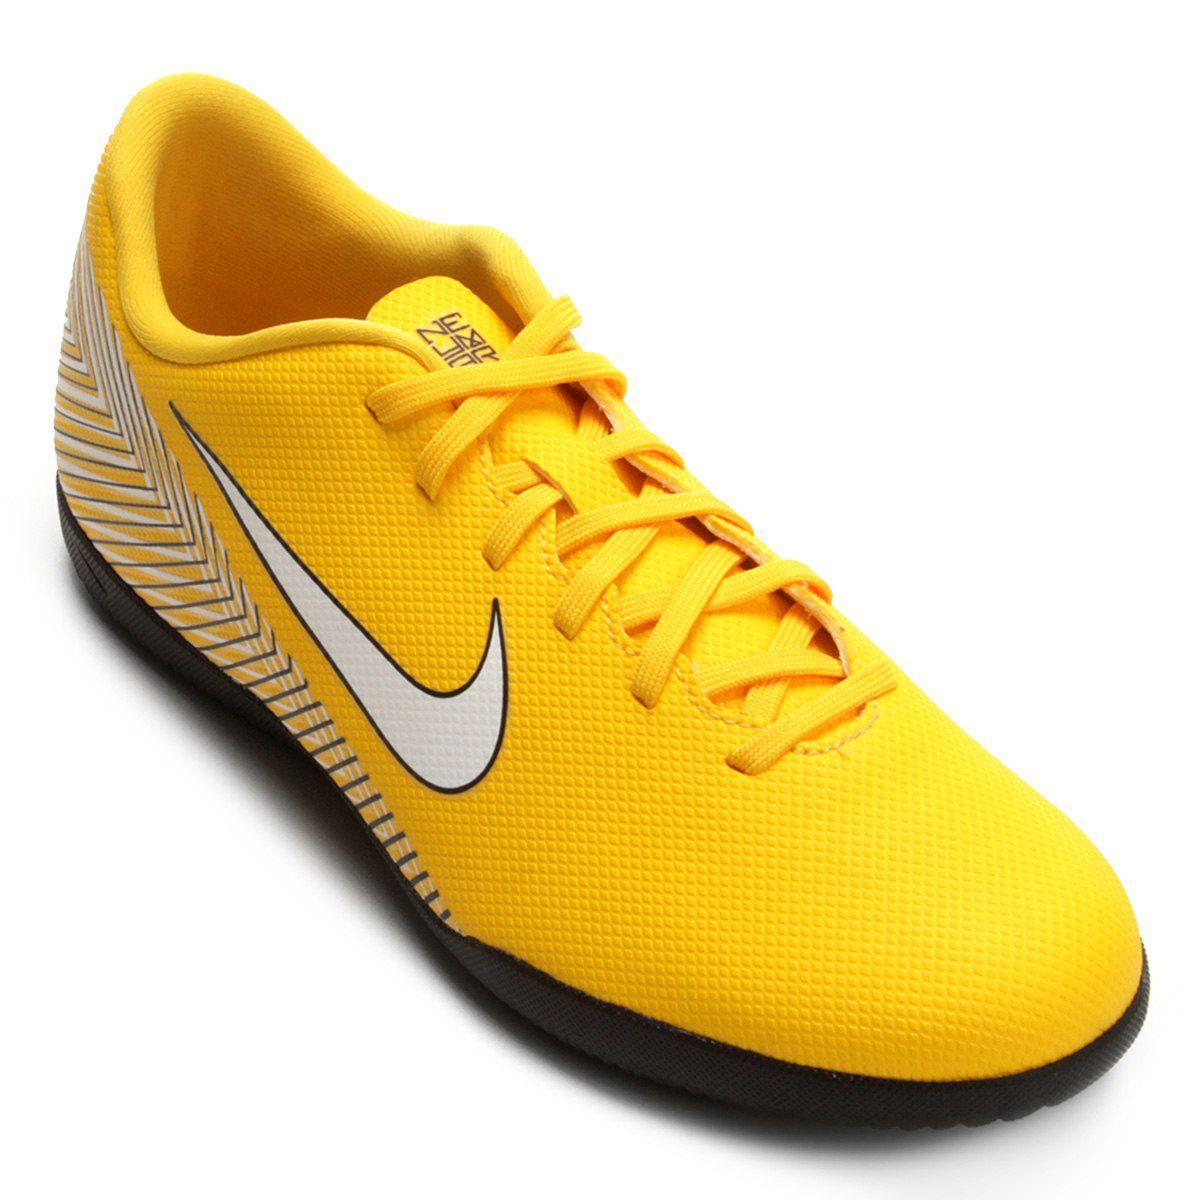 half off 96ac0 b4ebb Chuteira Society Nike Mercurial Vapor 13 Club - Masculino